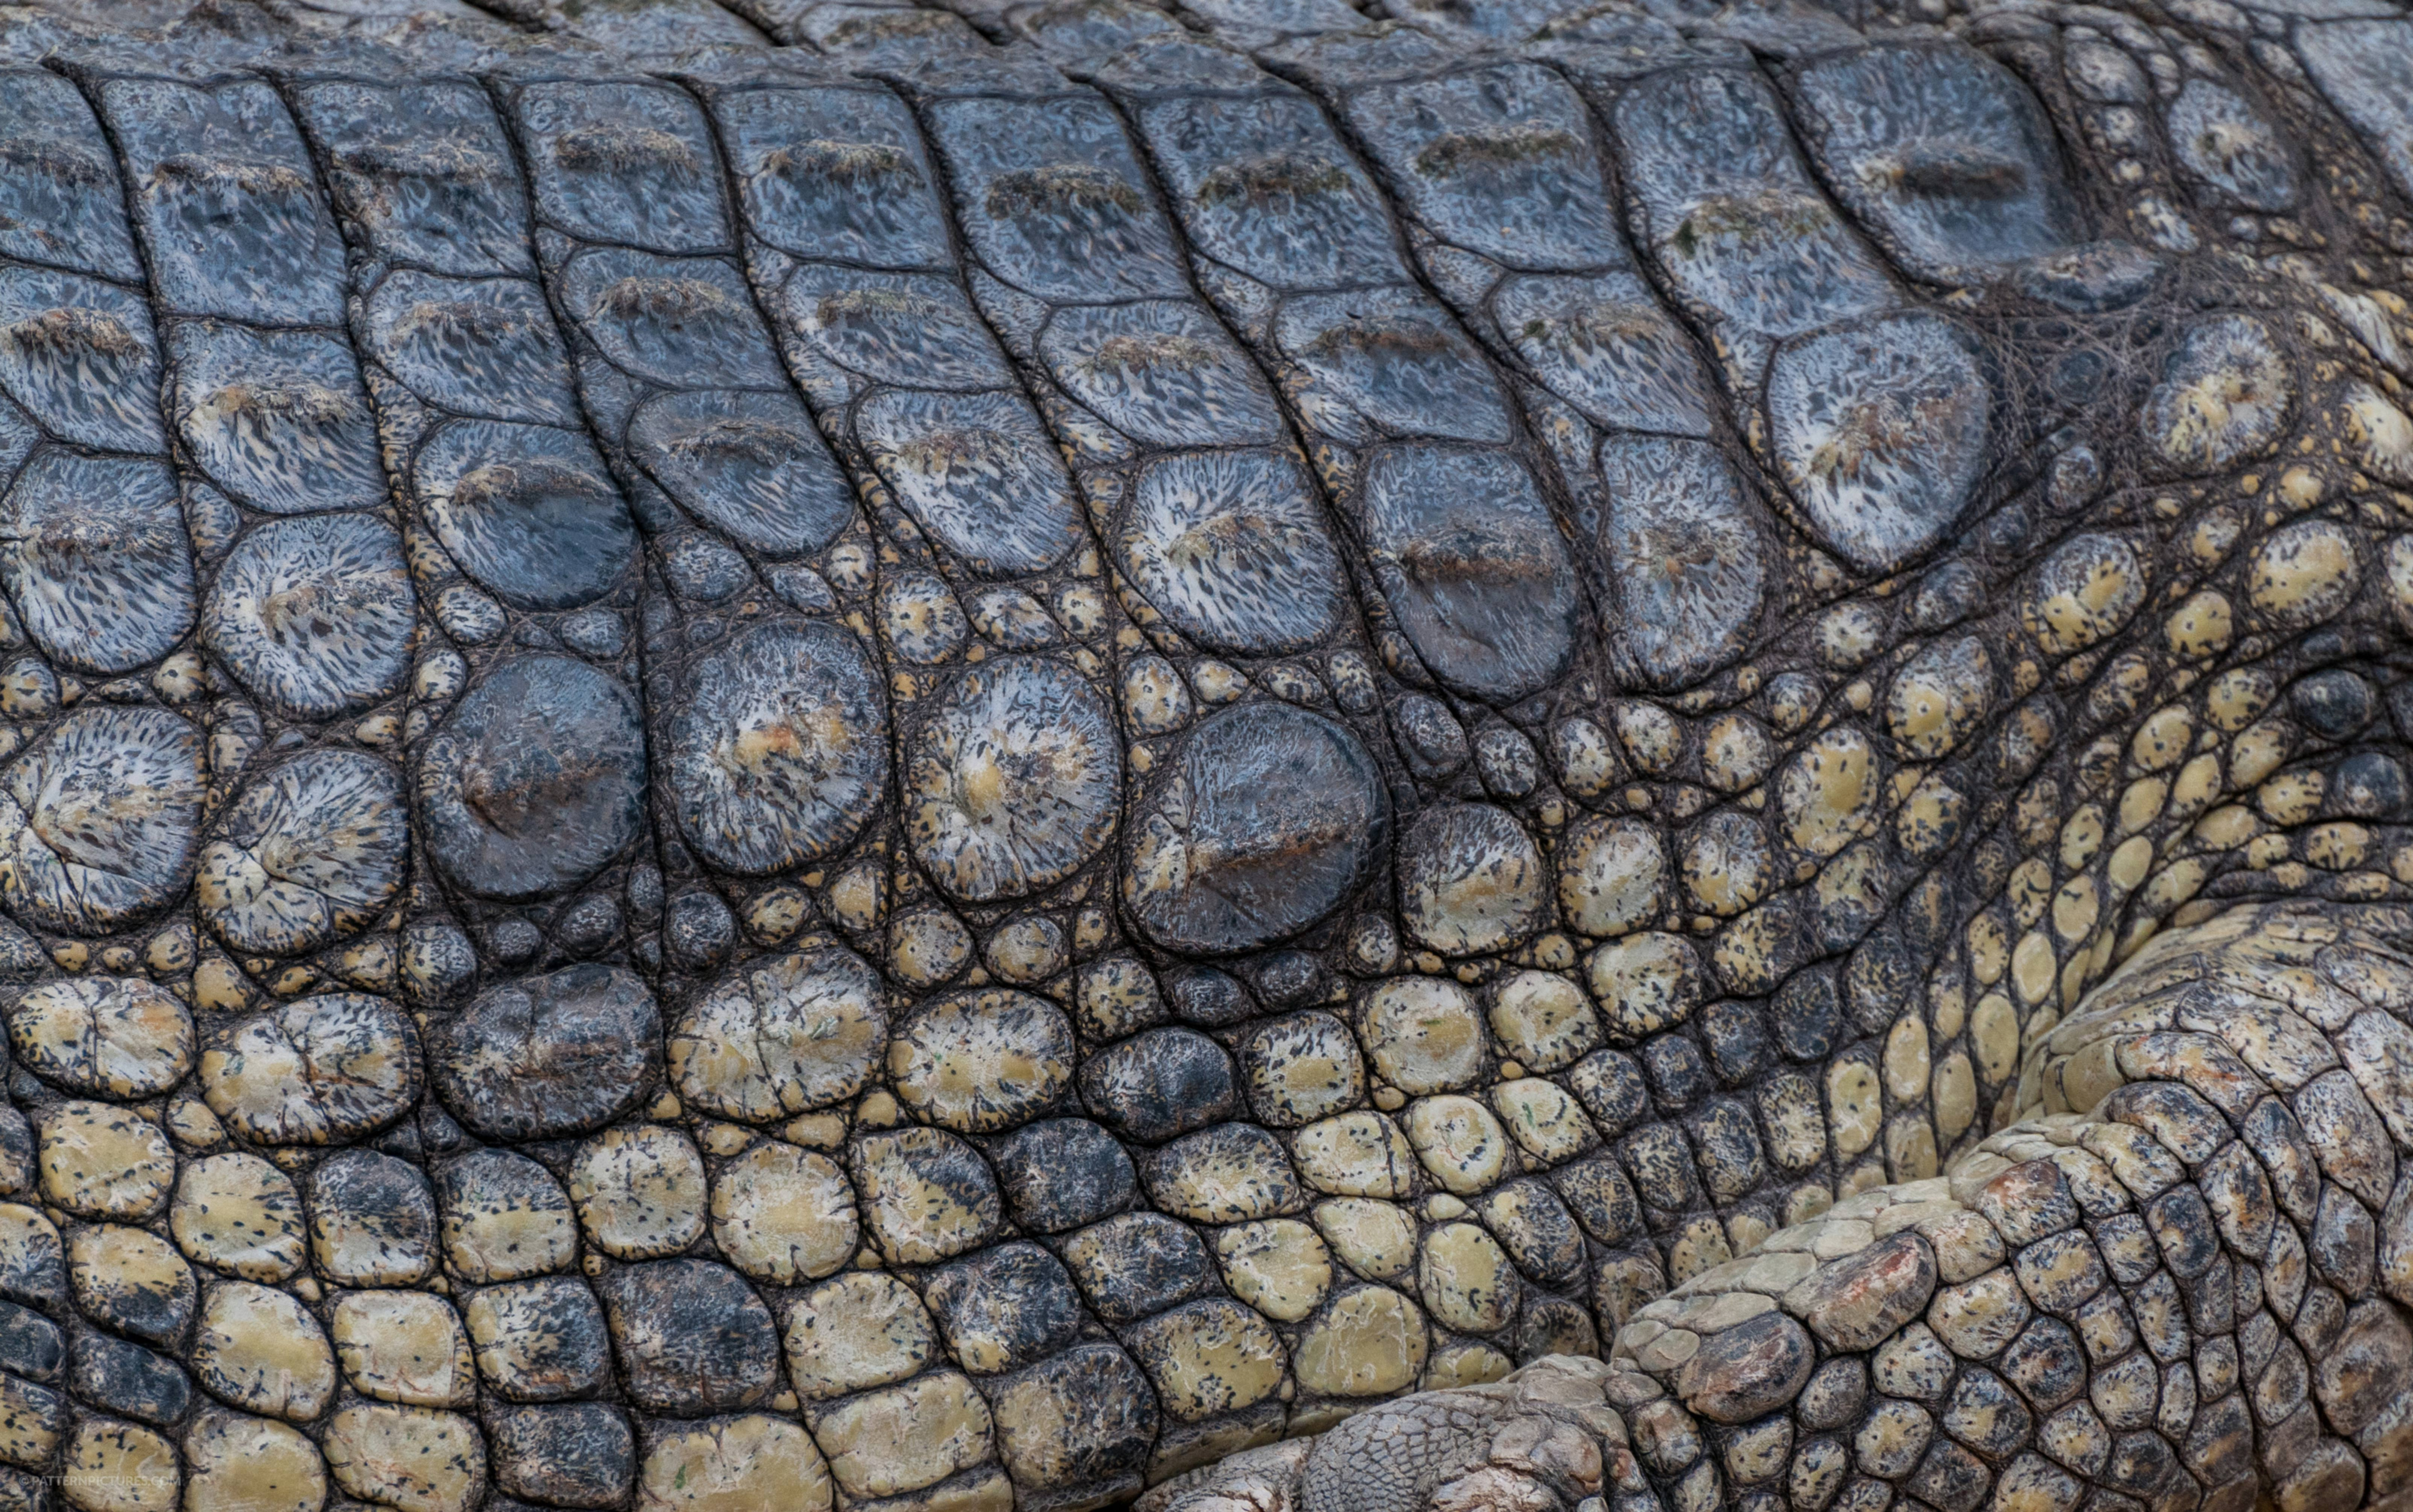 Crocodile skin texture reptile background